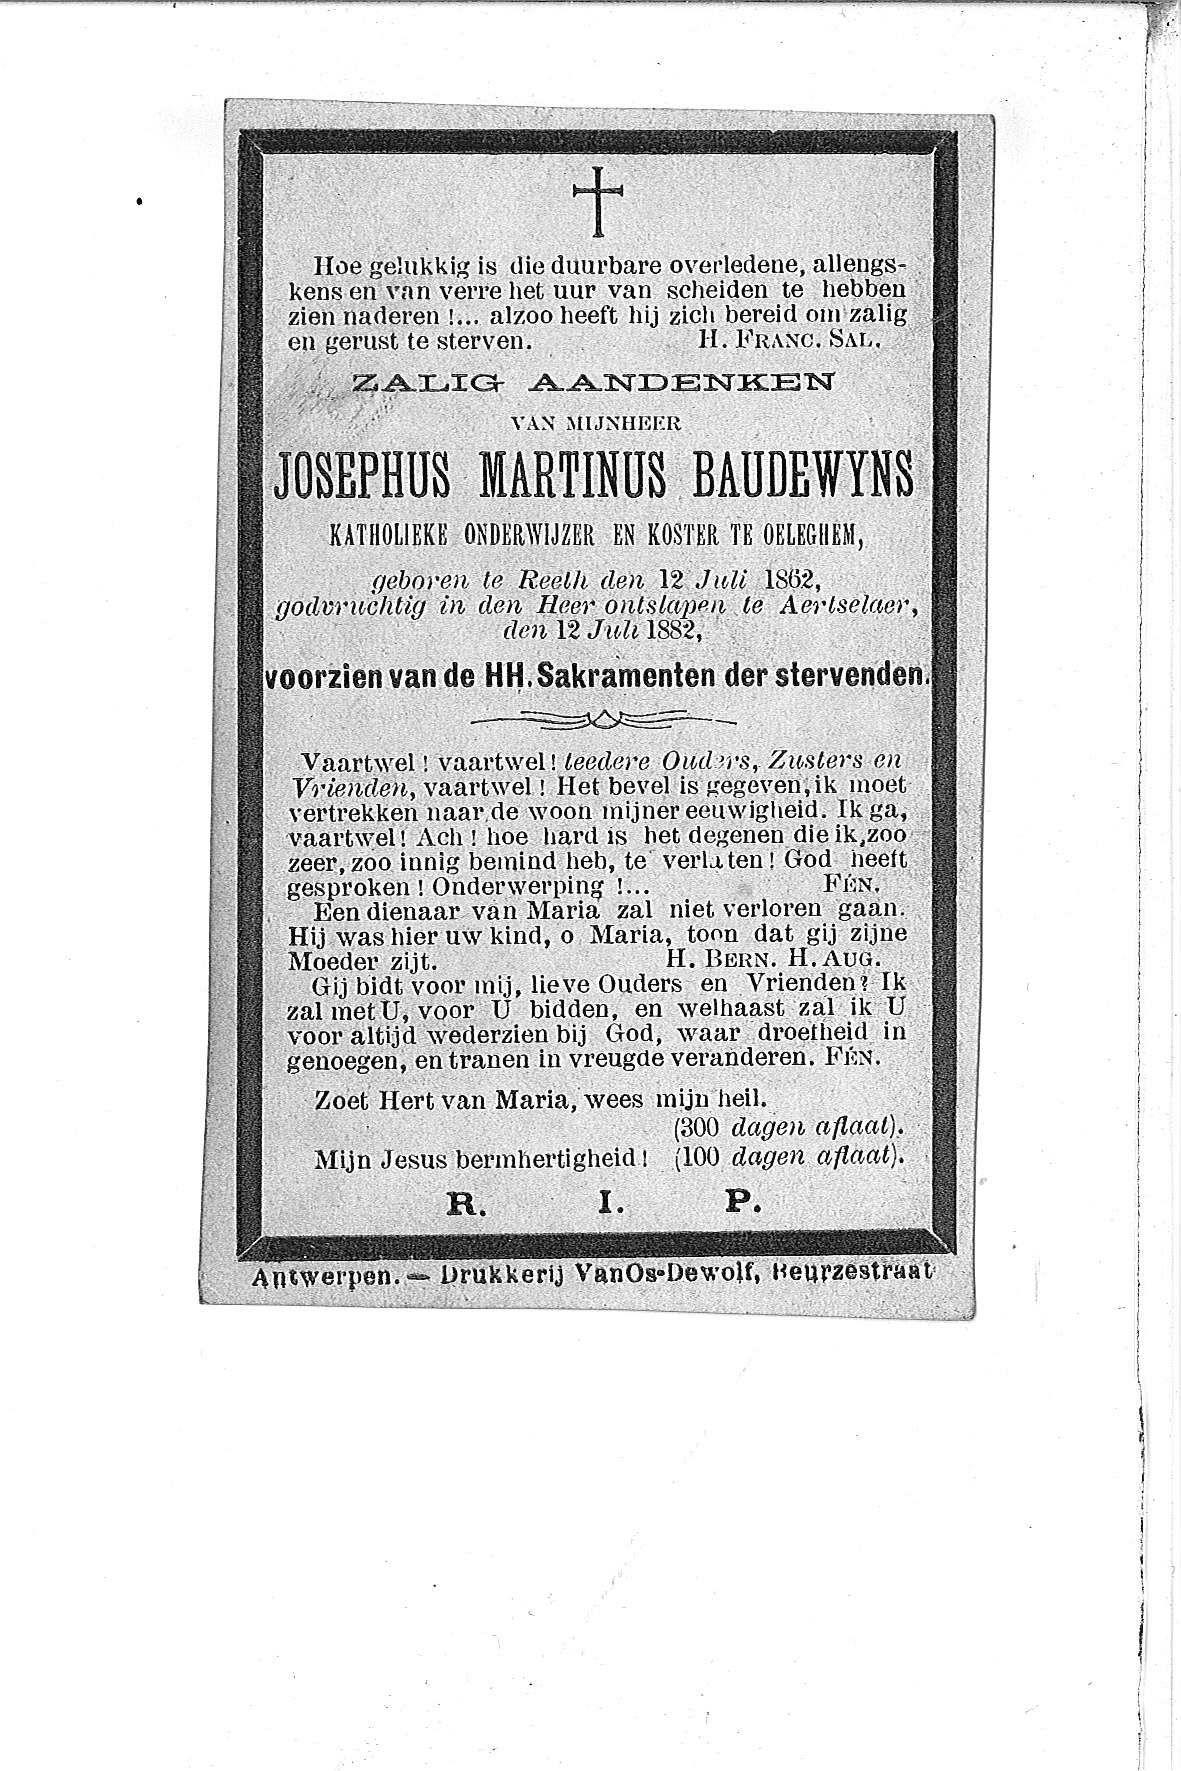 Josephus-Martinus(1882)20101022082750_00025.jpg